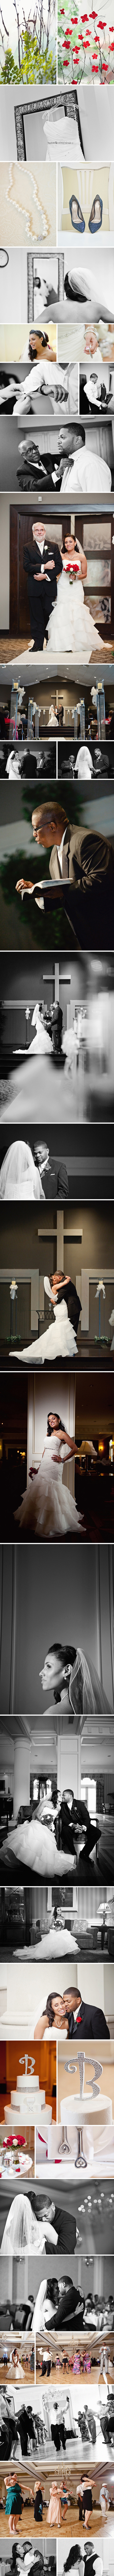 The Vineyard Columbus Wedding